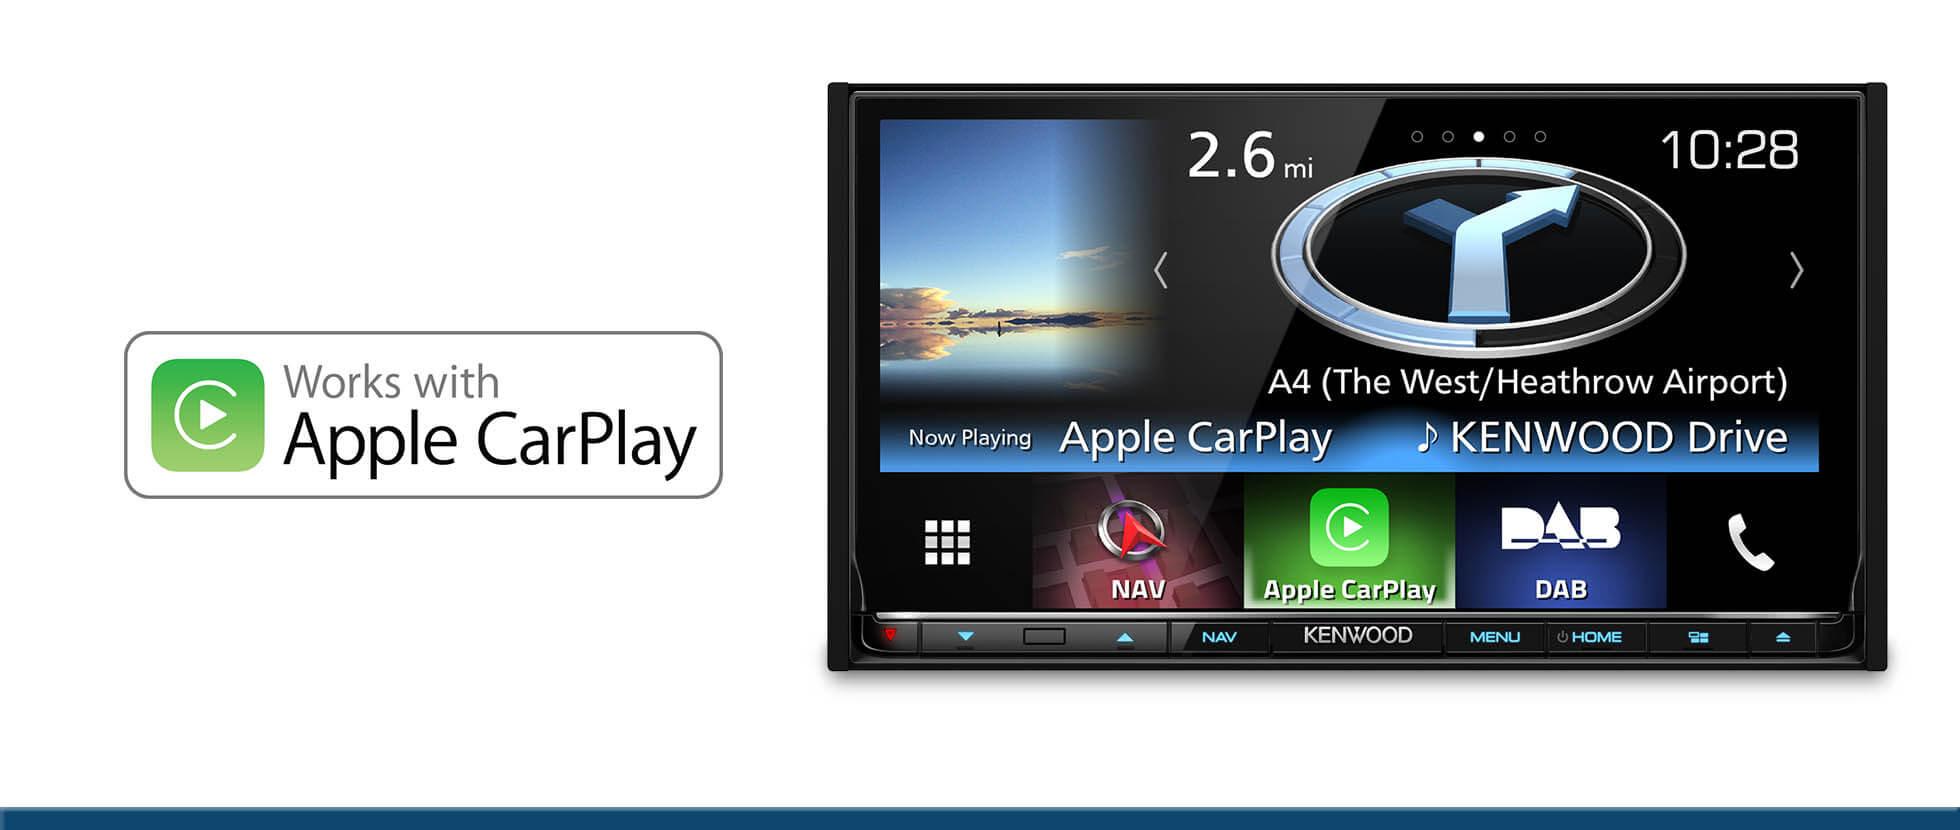 sat nav apple carplay android auto car audio dab. Black Bedroom Furniture Sets. Home Design Ideas